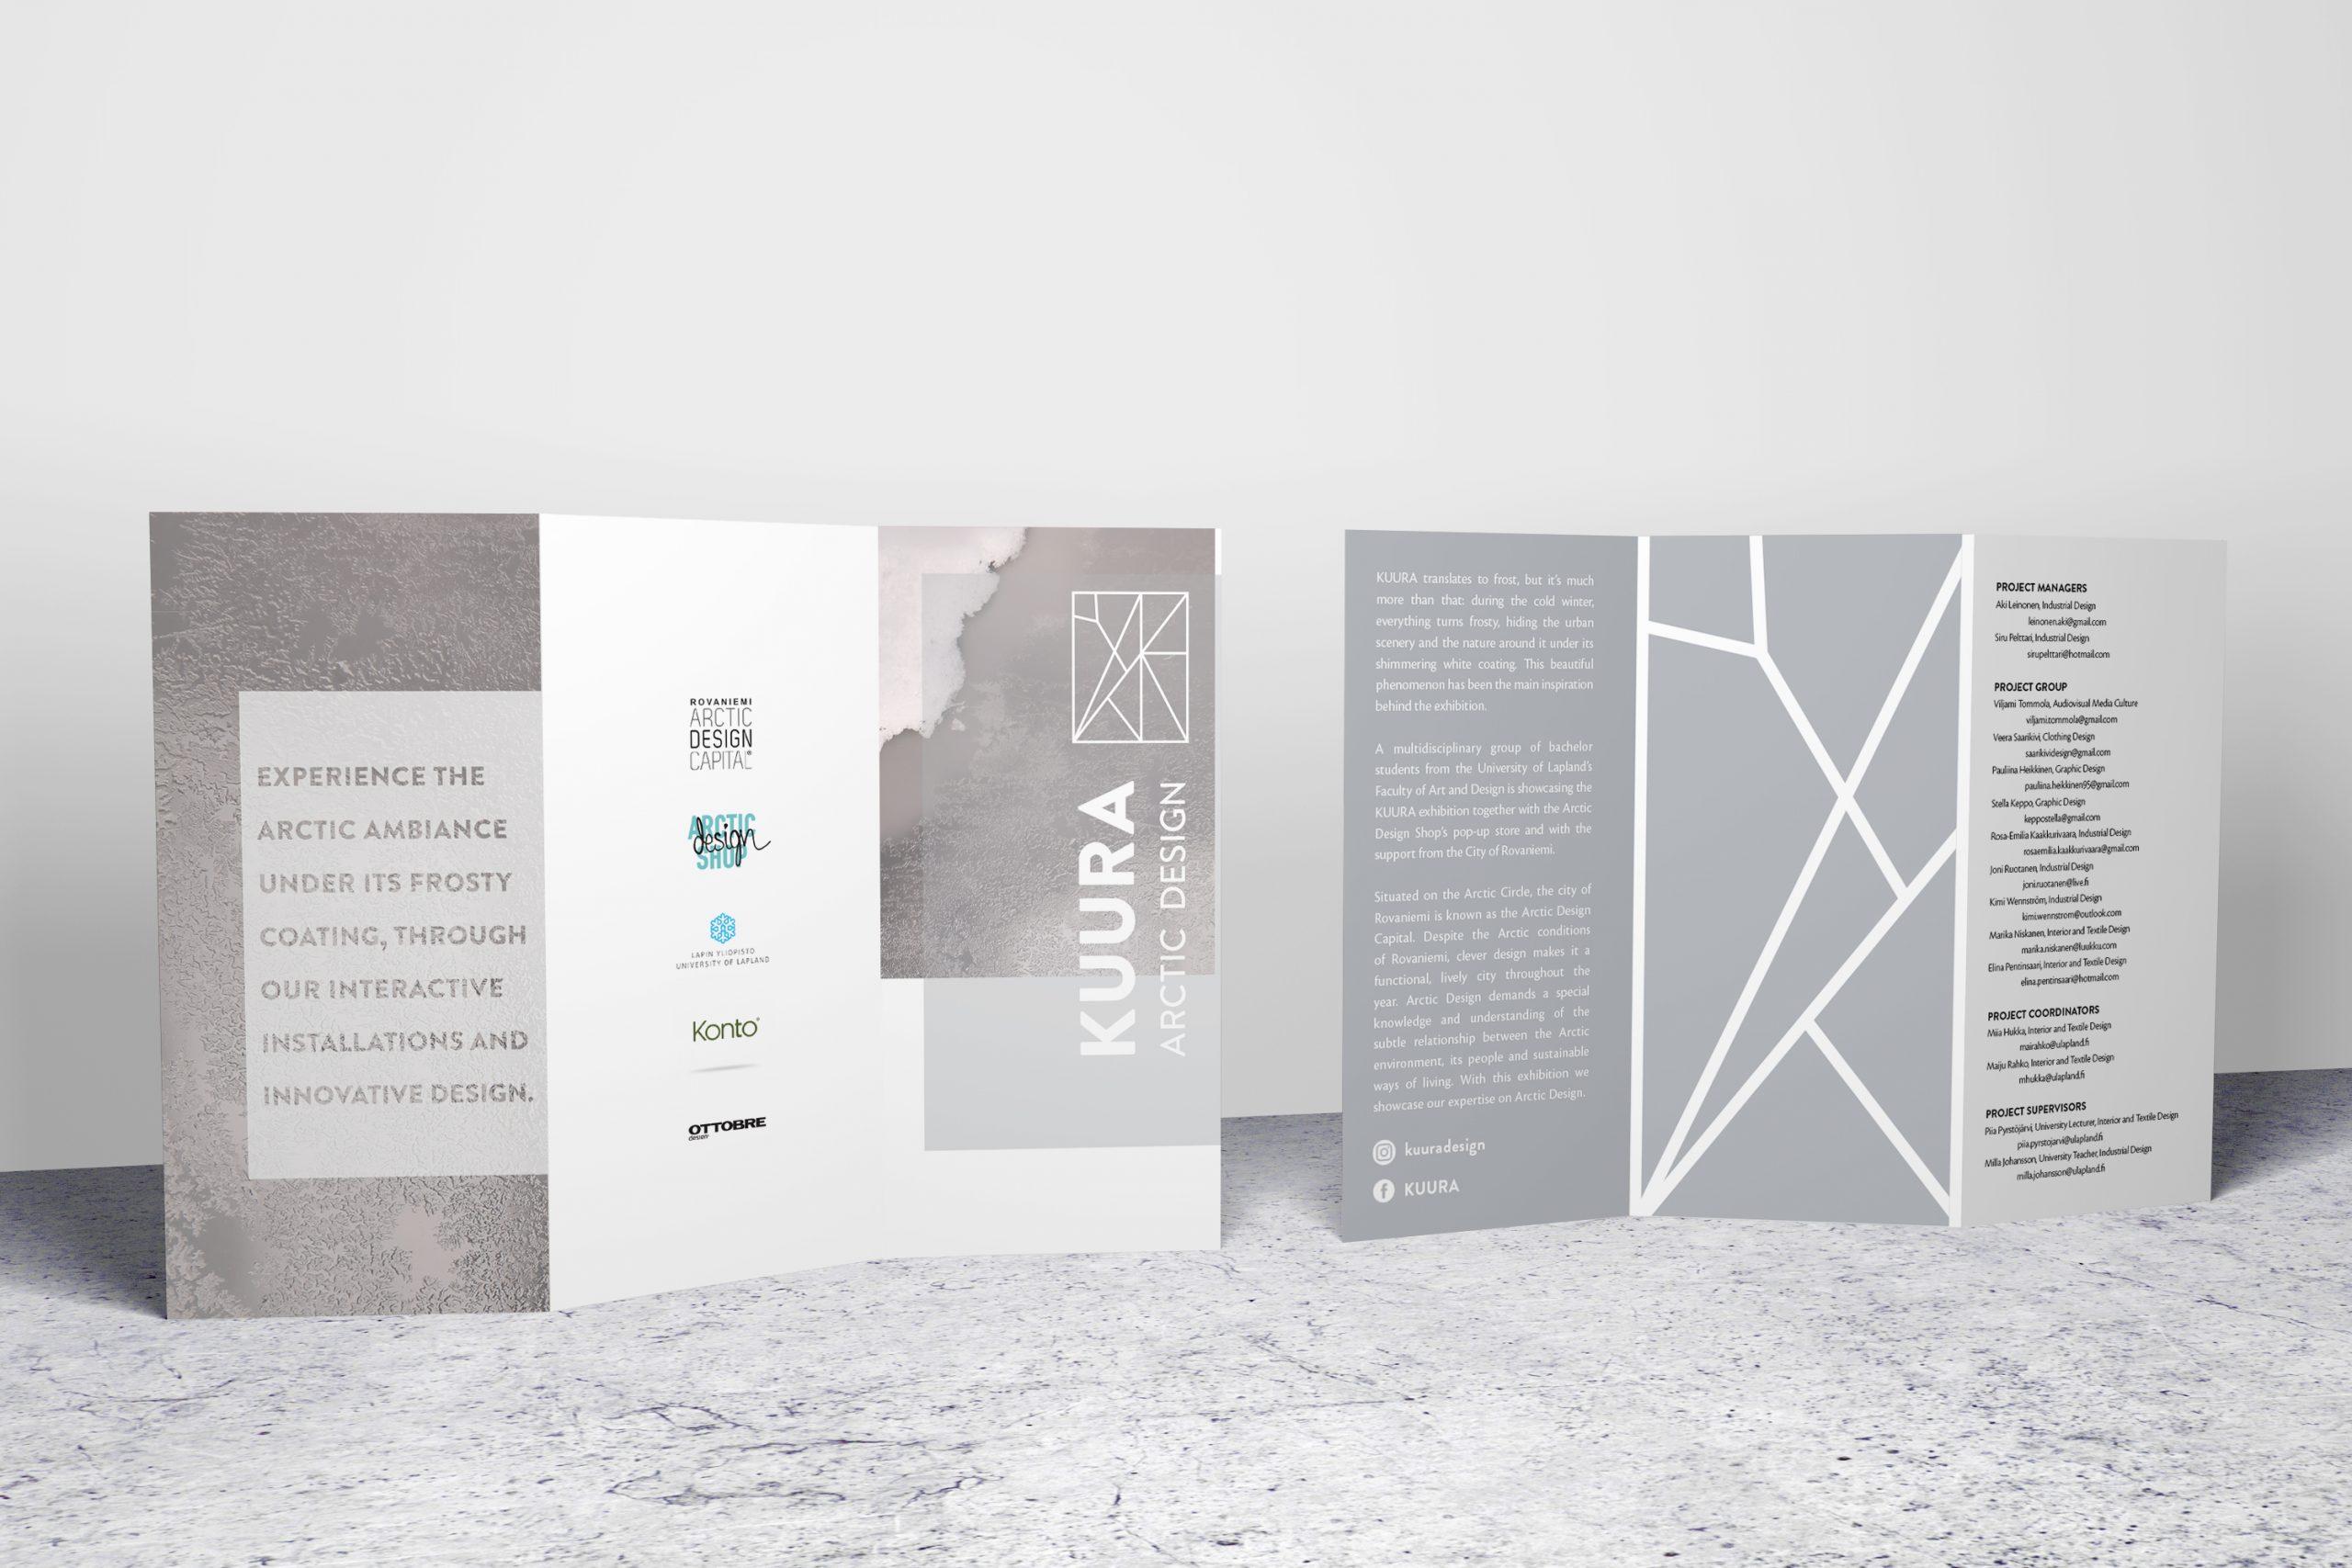 PALEDESIGN_KUURA_brochure